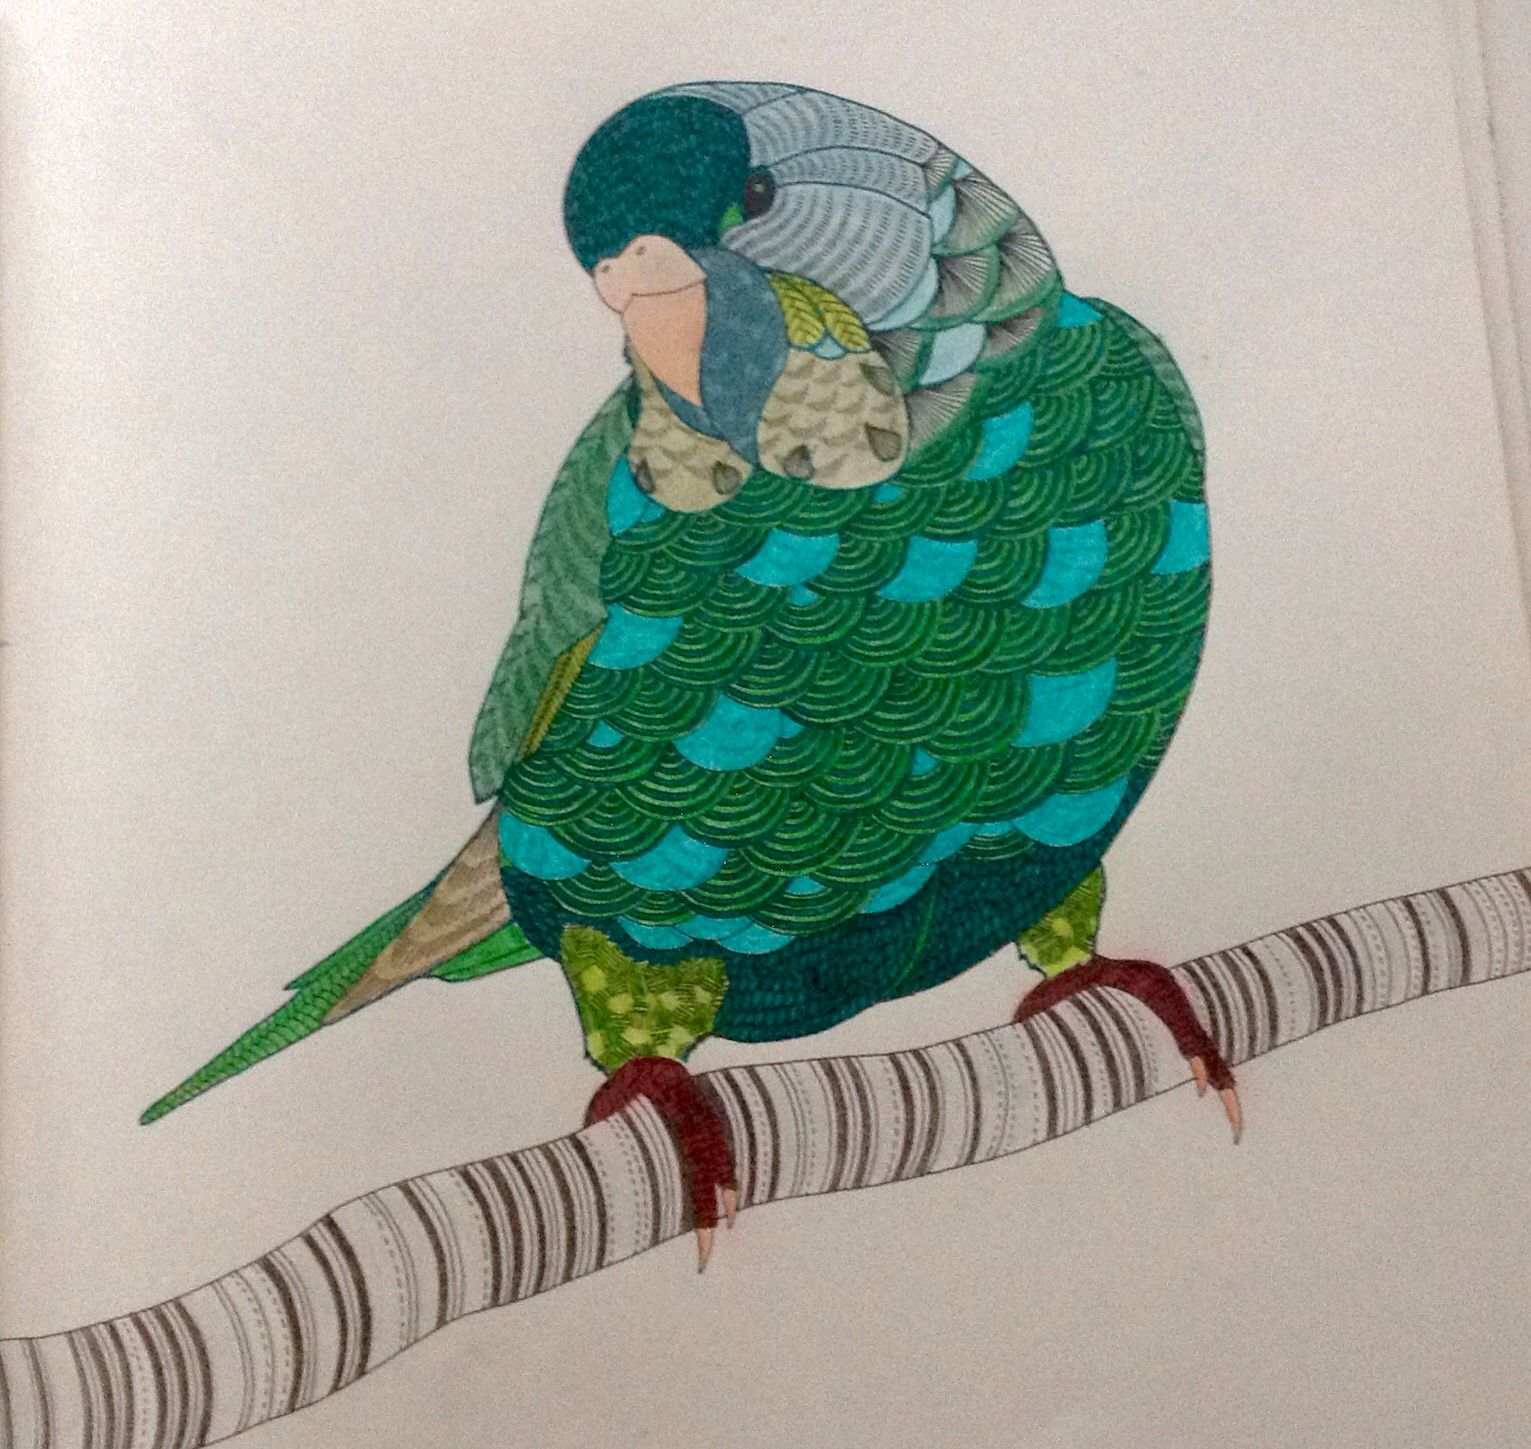 Millie Marotta Dierenrijk Kleurboek Okki Animal Kingdom Colouring Book Millie Marotta Animal Kingdom Millie Marotta